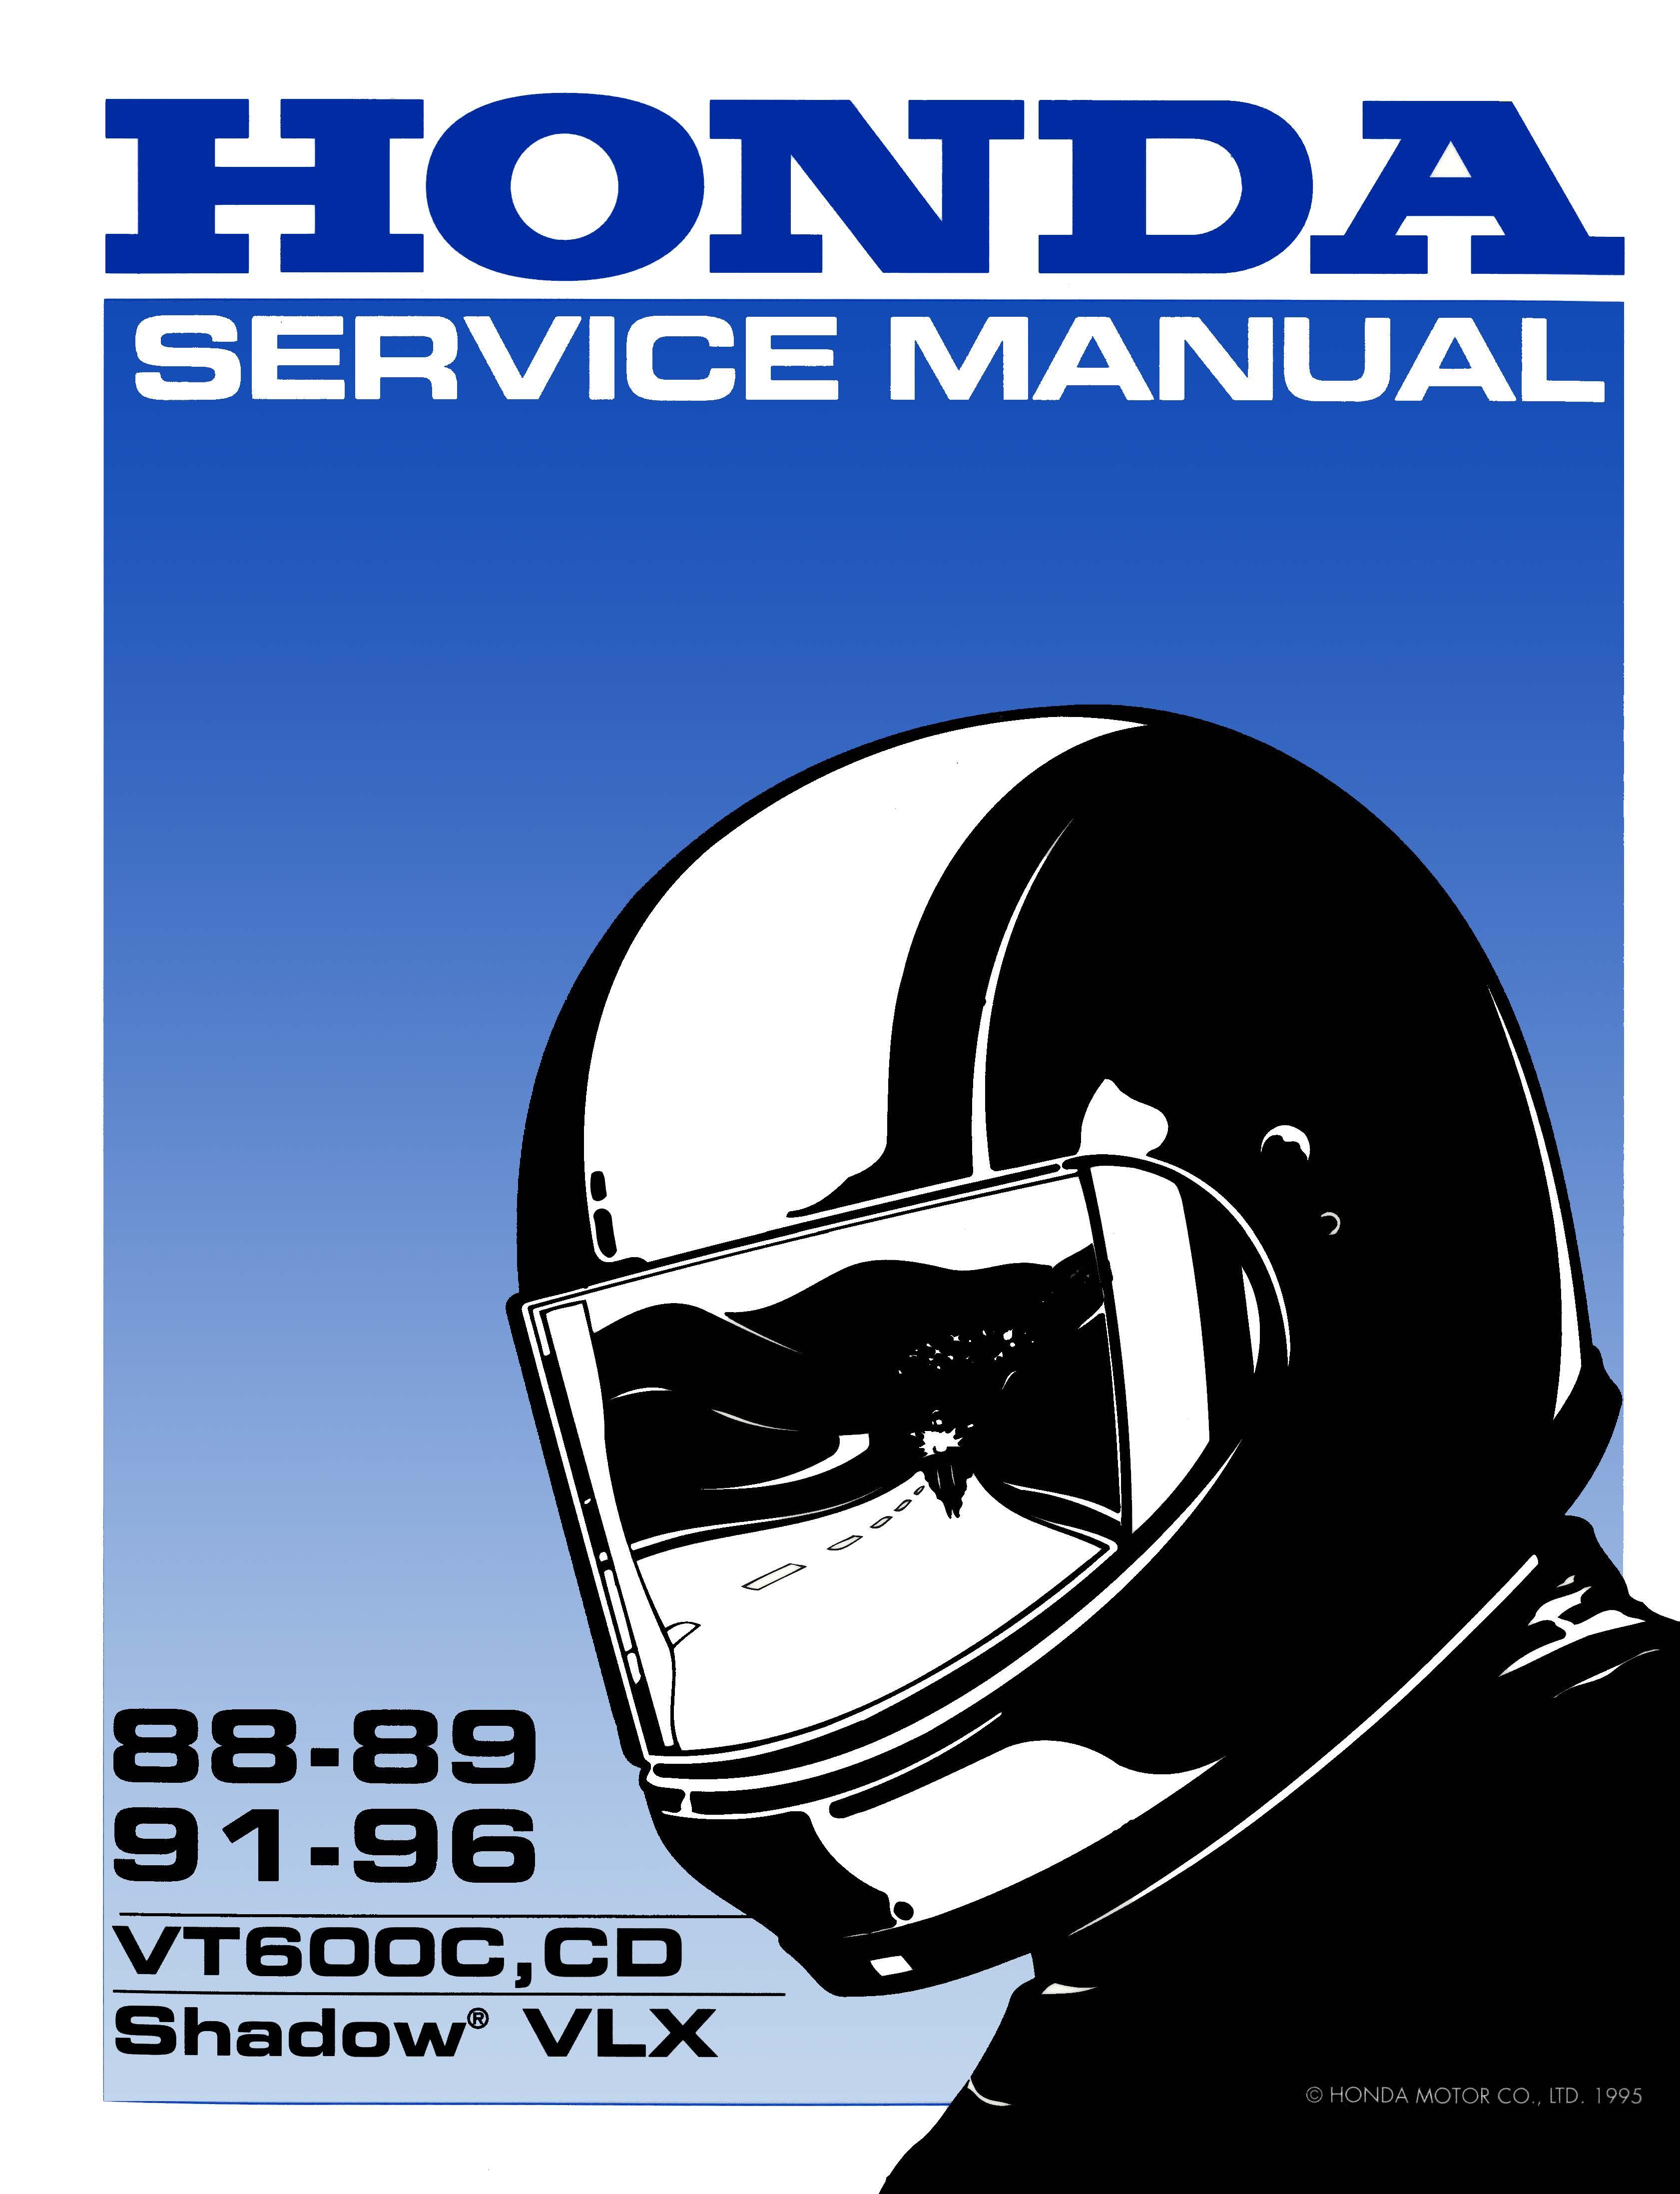 Workshop manual for Honda VLX600 (1988-1989 / 1991-1996)